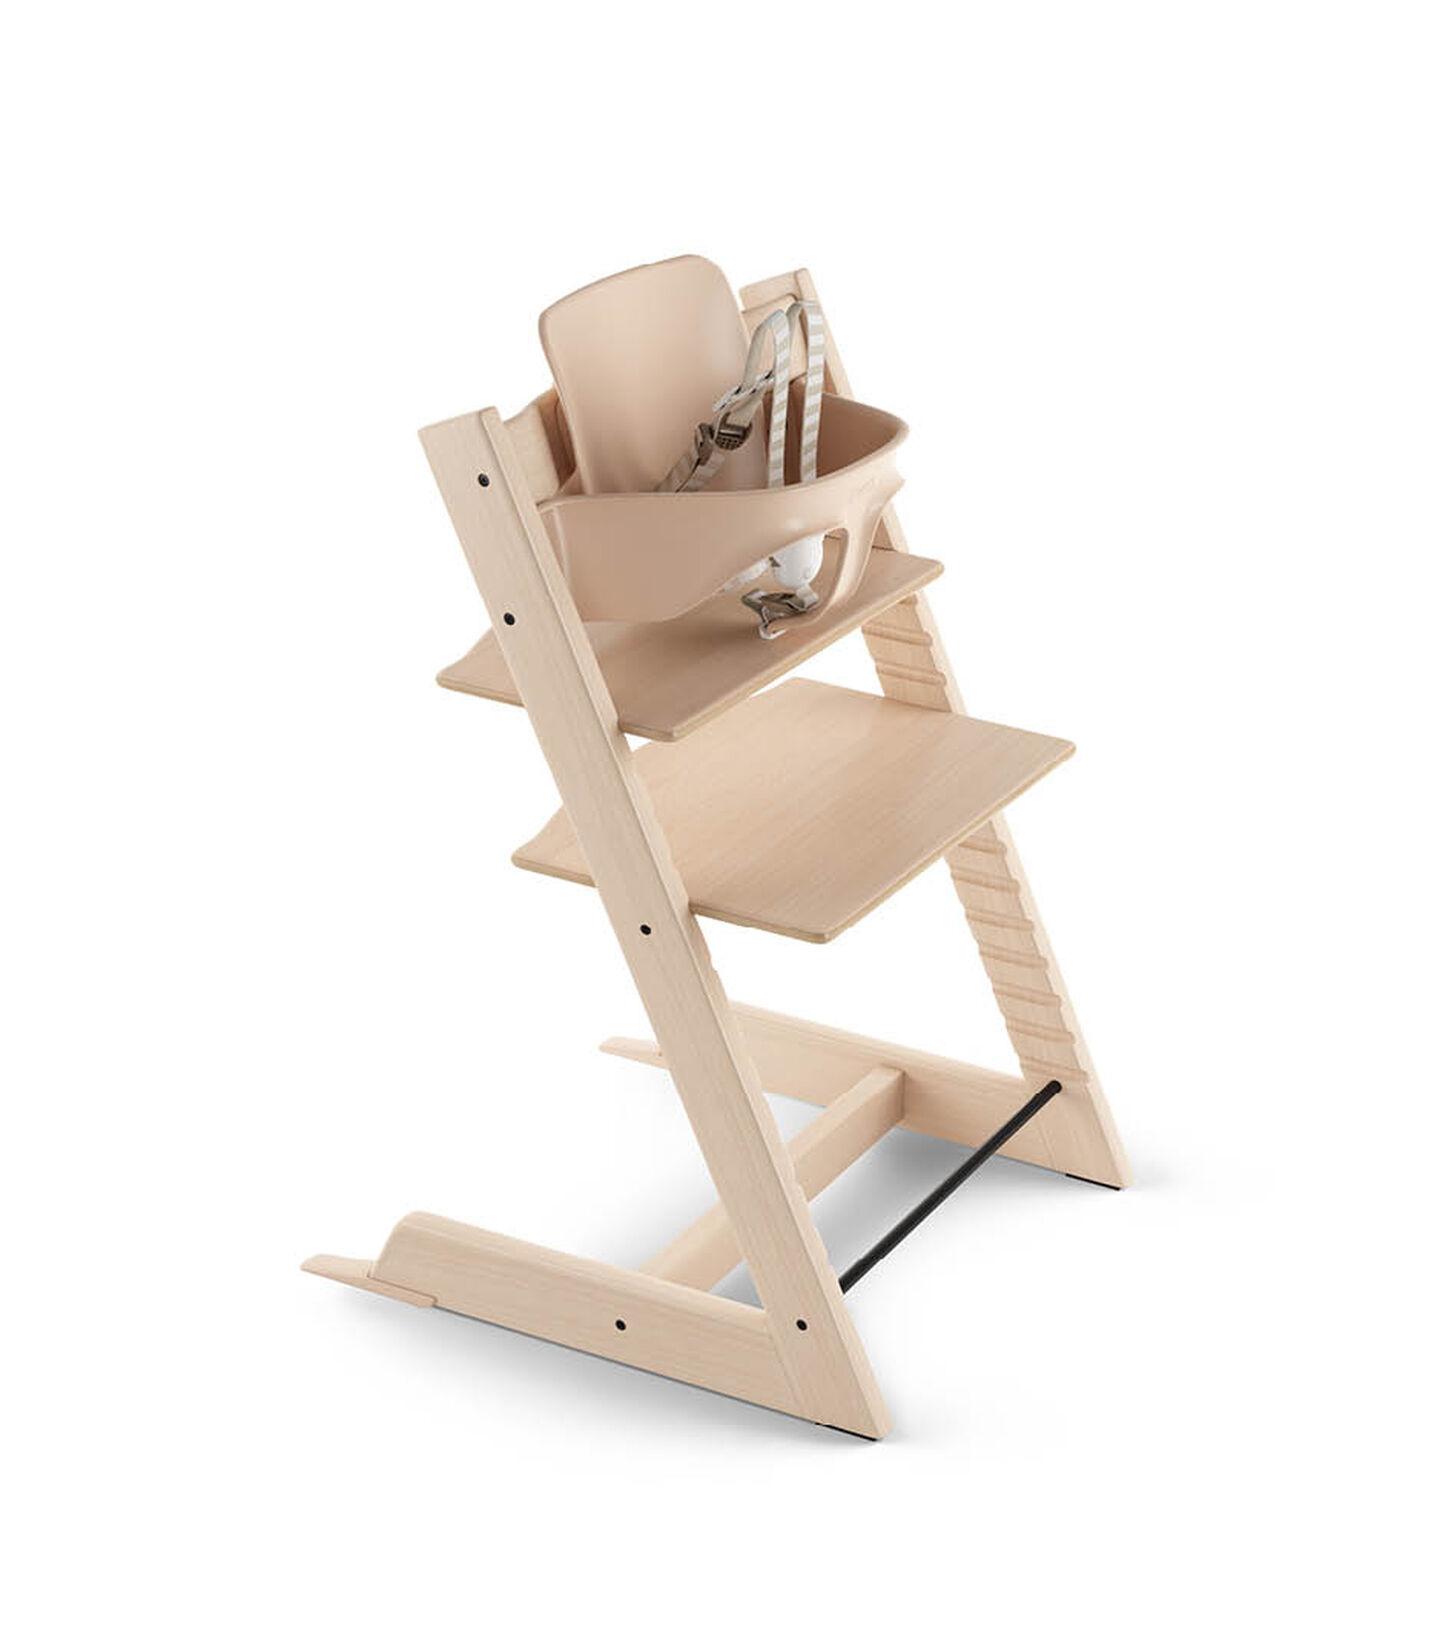 Tripp Trapp® Bundle High Chair US 18 Natural, Natural, mainview view 1